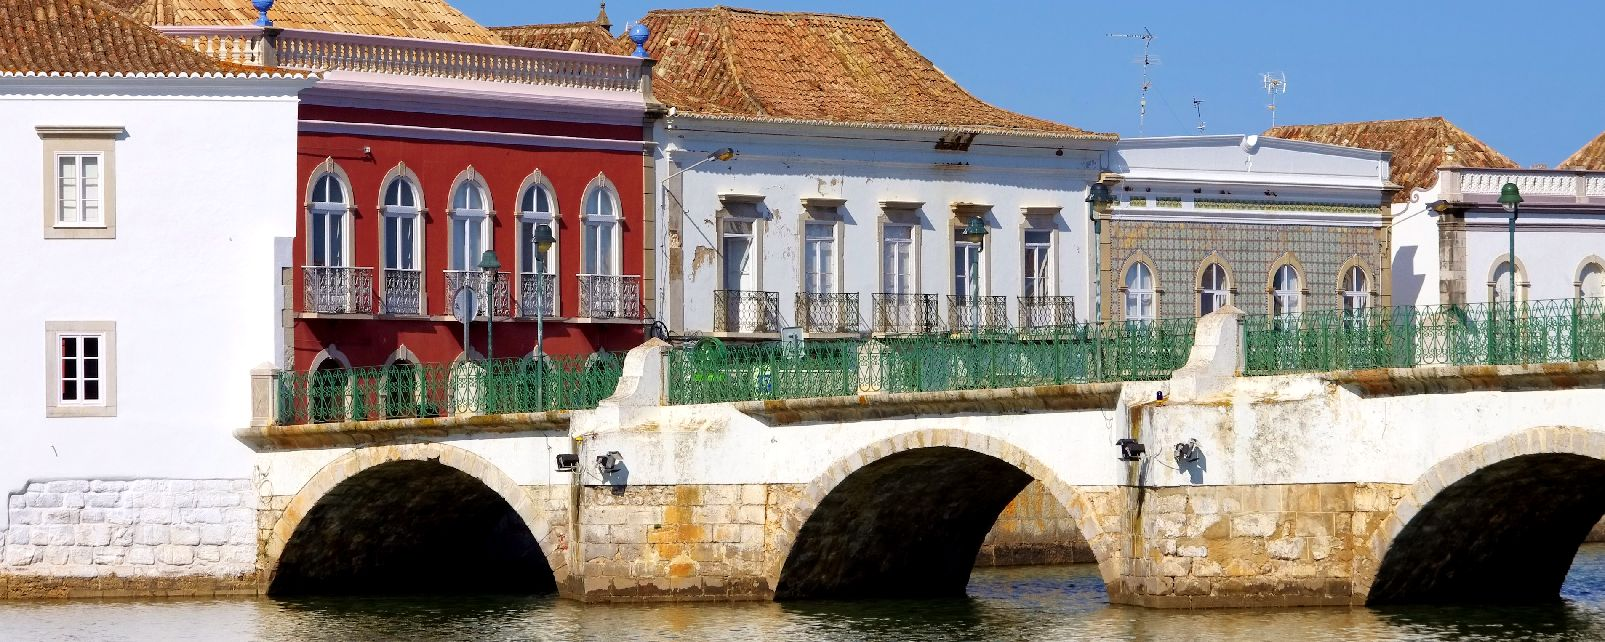 Portugal Vieille Ville